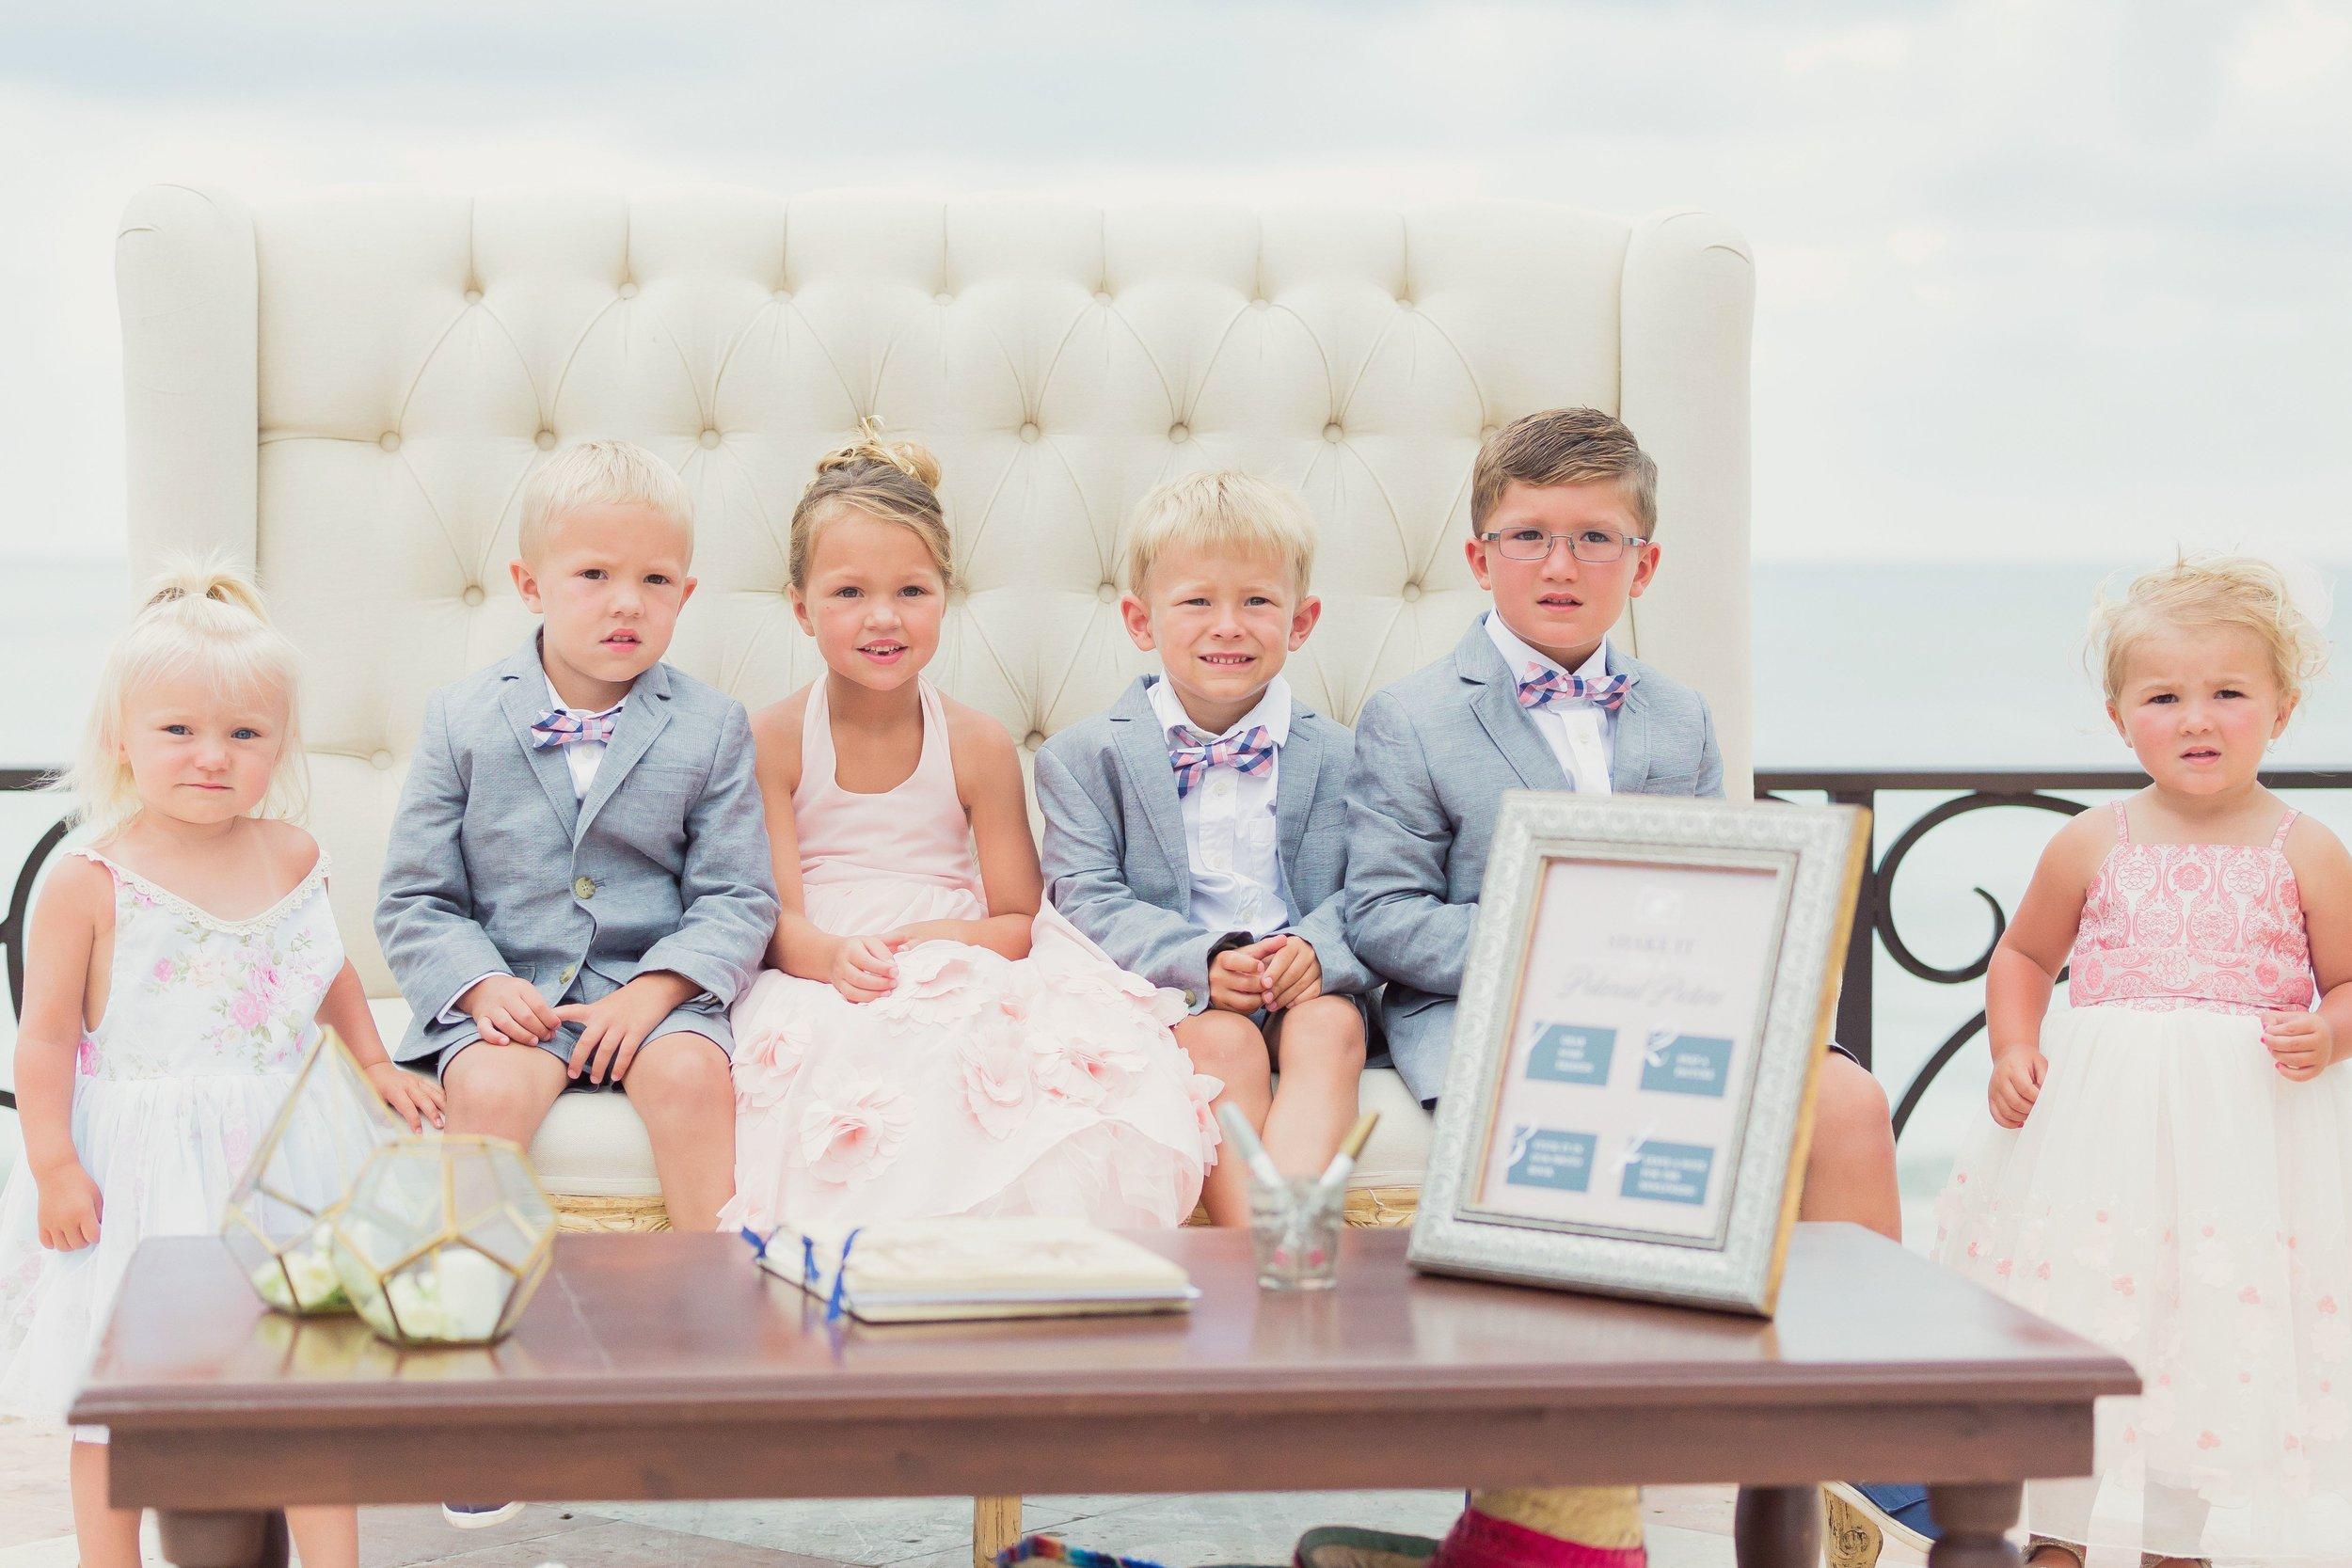 cancun-wedding-venue-villa-la-joya-60 copy-websize.jpg